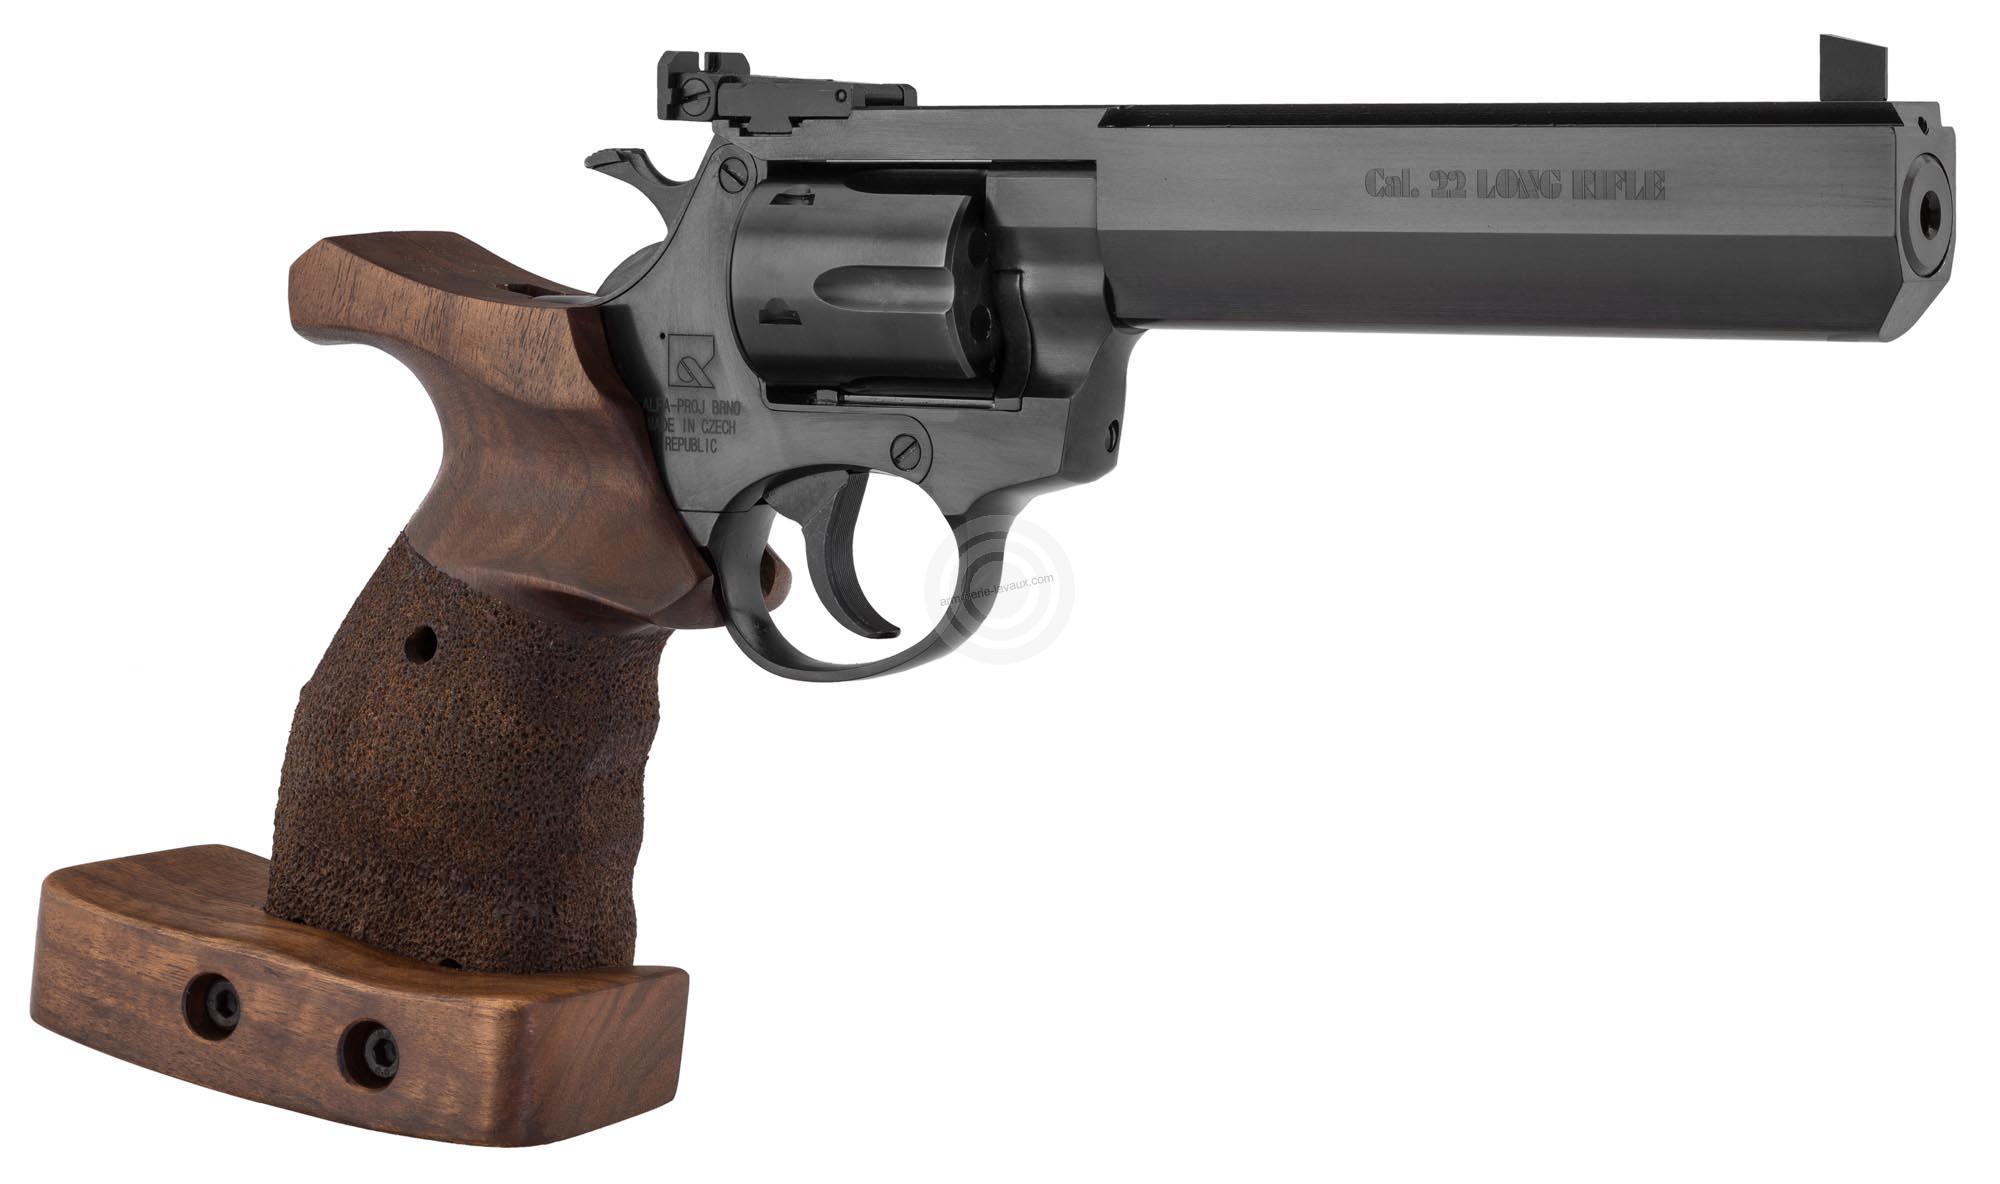 revolver alfa proj sport 6 u0026 39  u0026 39  bronz u00e9 cal 22 lr